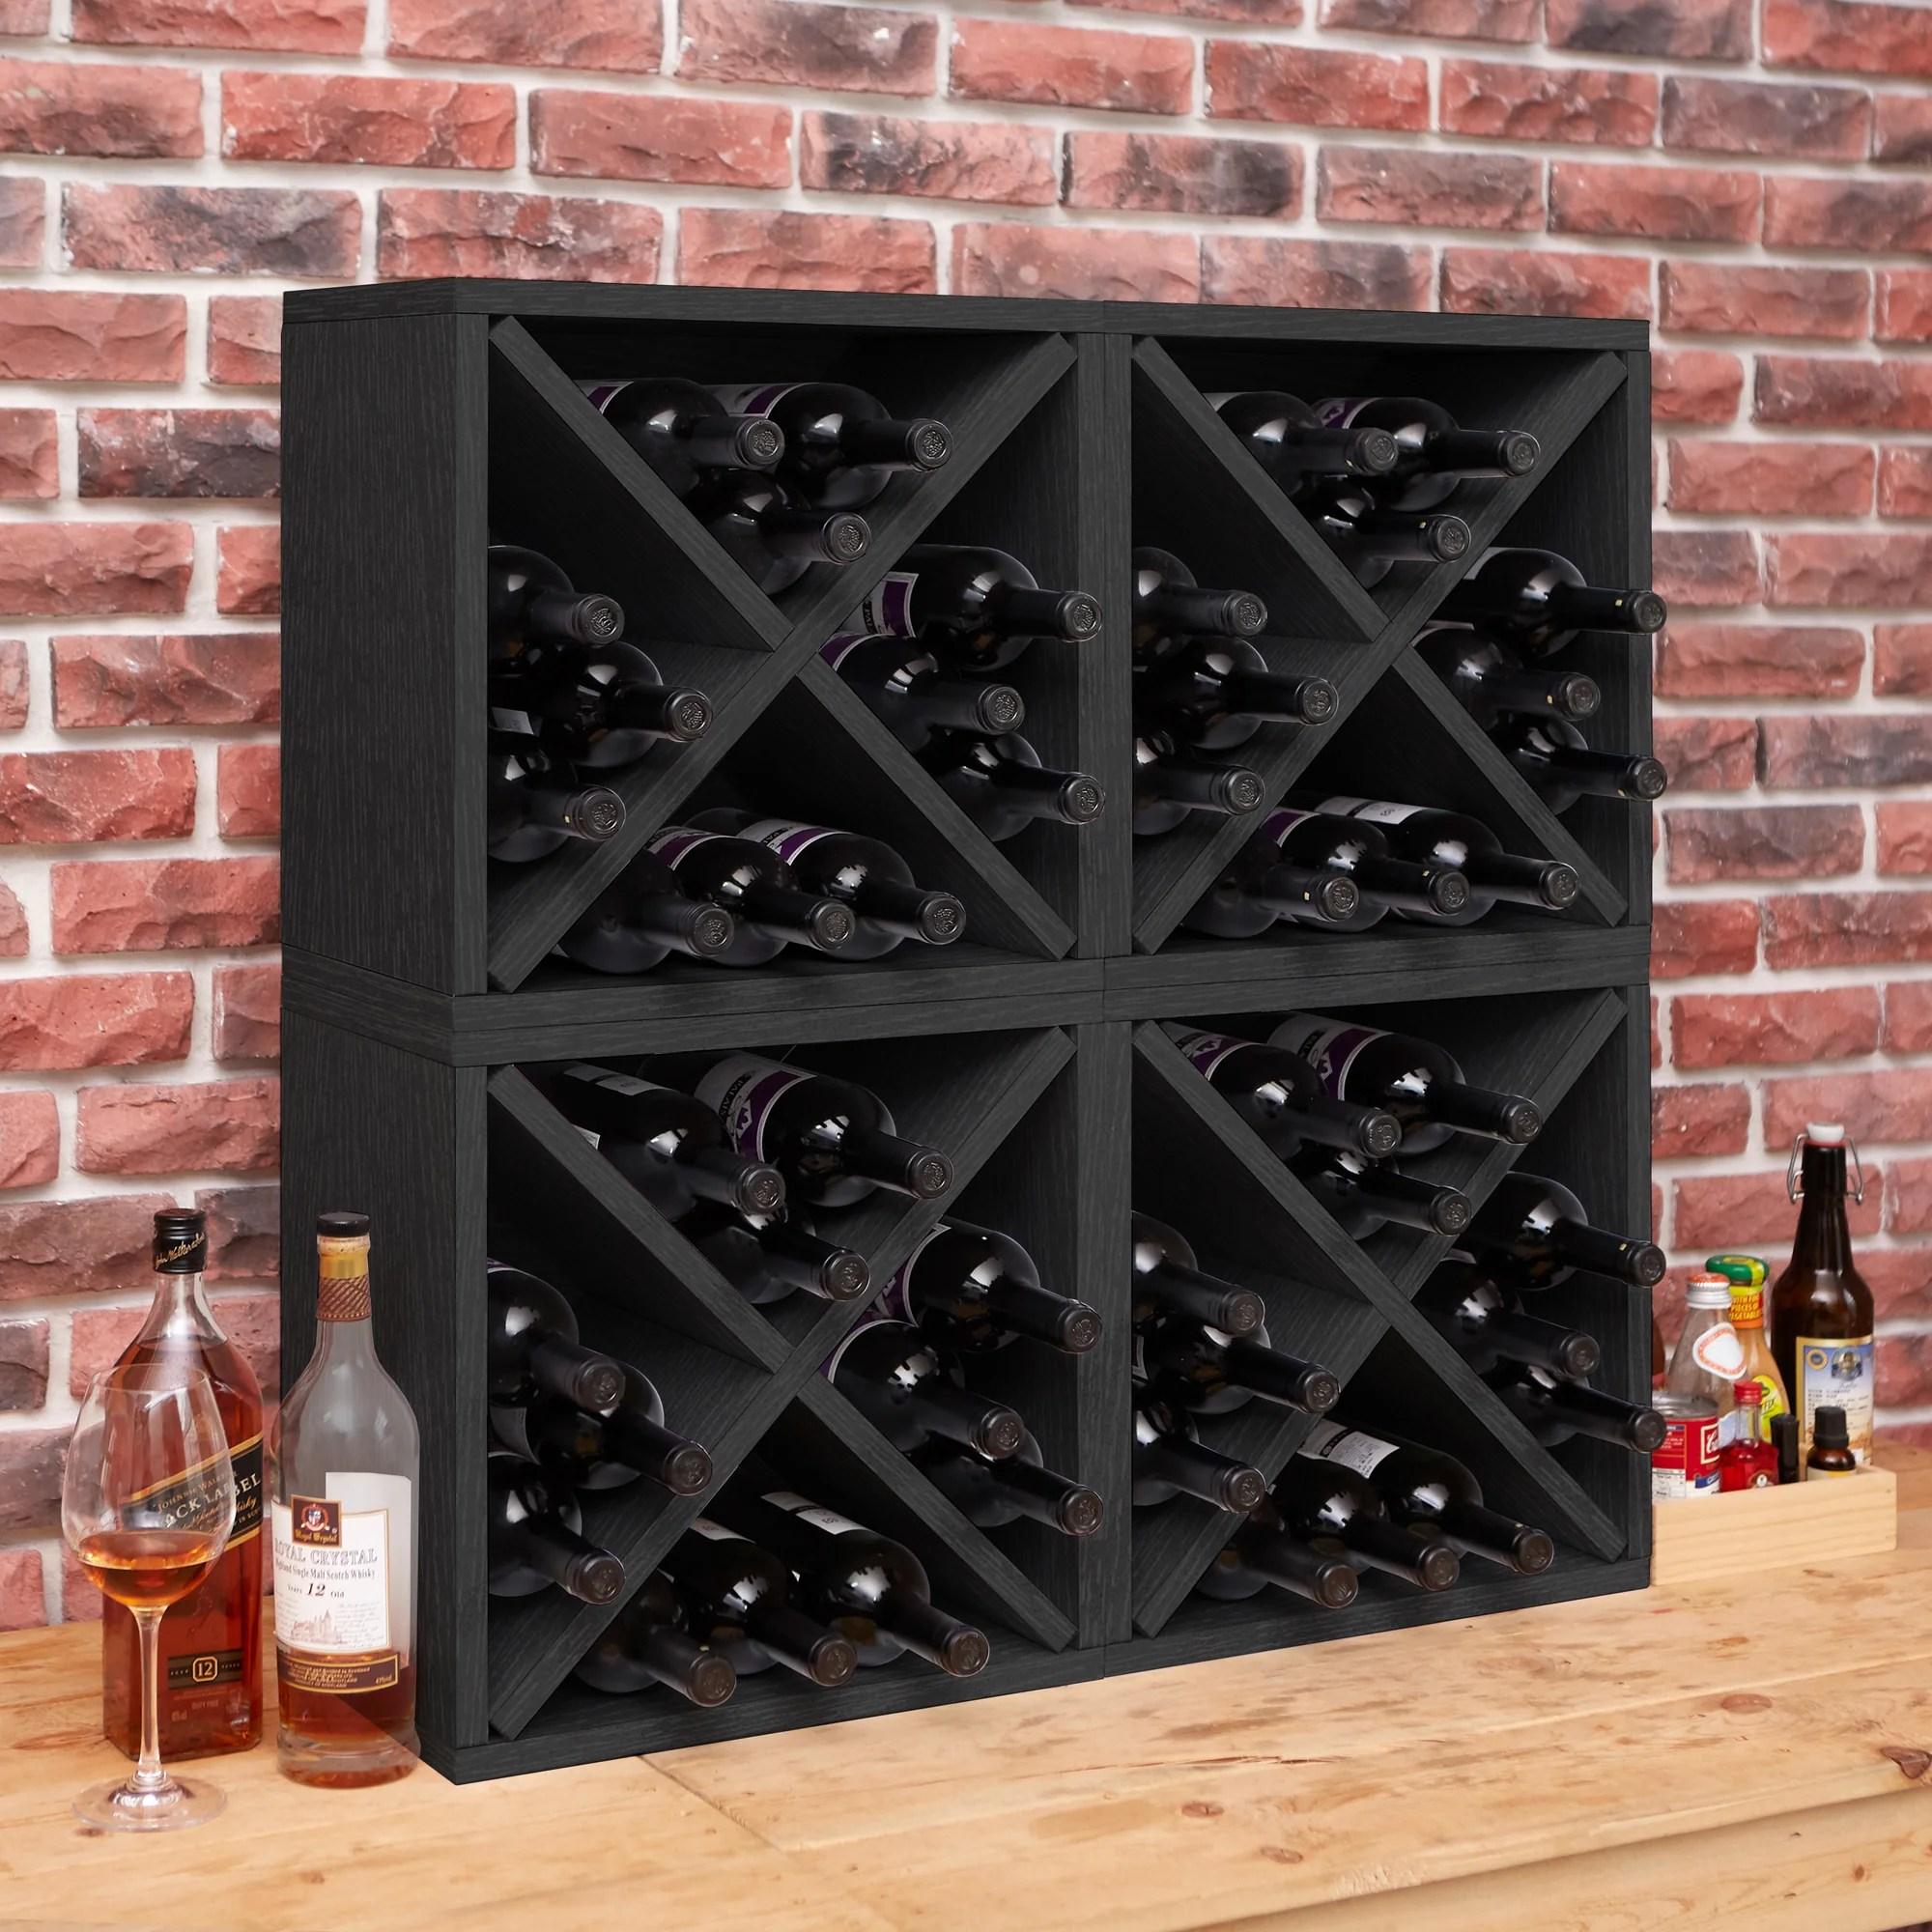 wine storage cheaper than retail price